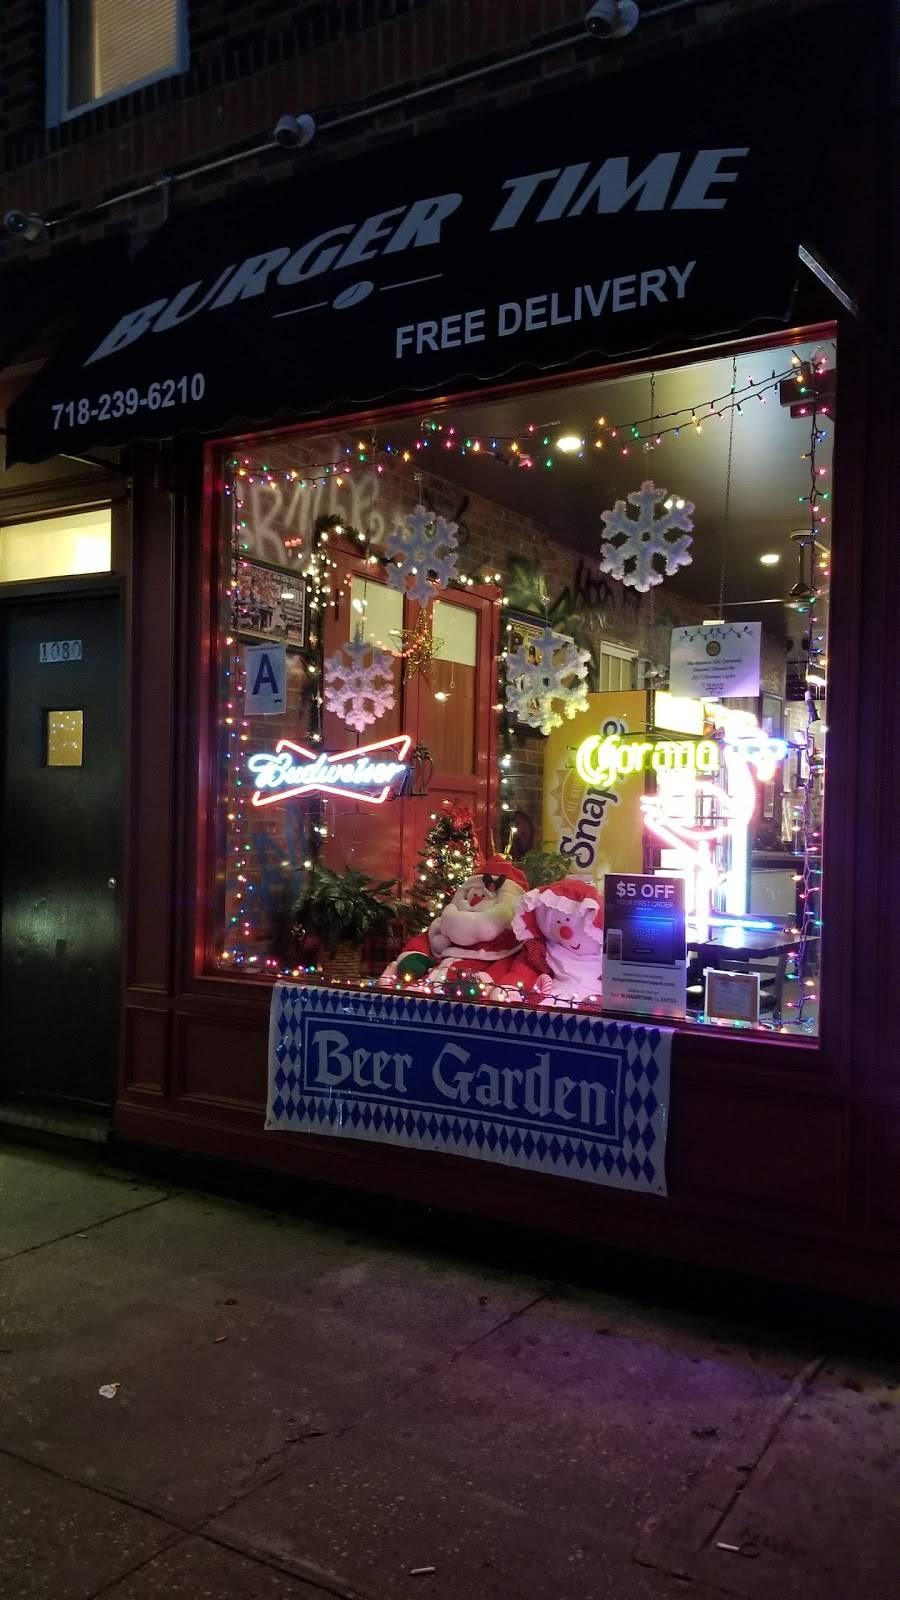 Burger Time | restaurant | 1080 Morris Park Ave, Bronx, NY 10461, USA | 7182396210 OR +1 718-239-6210